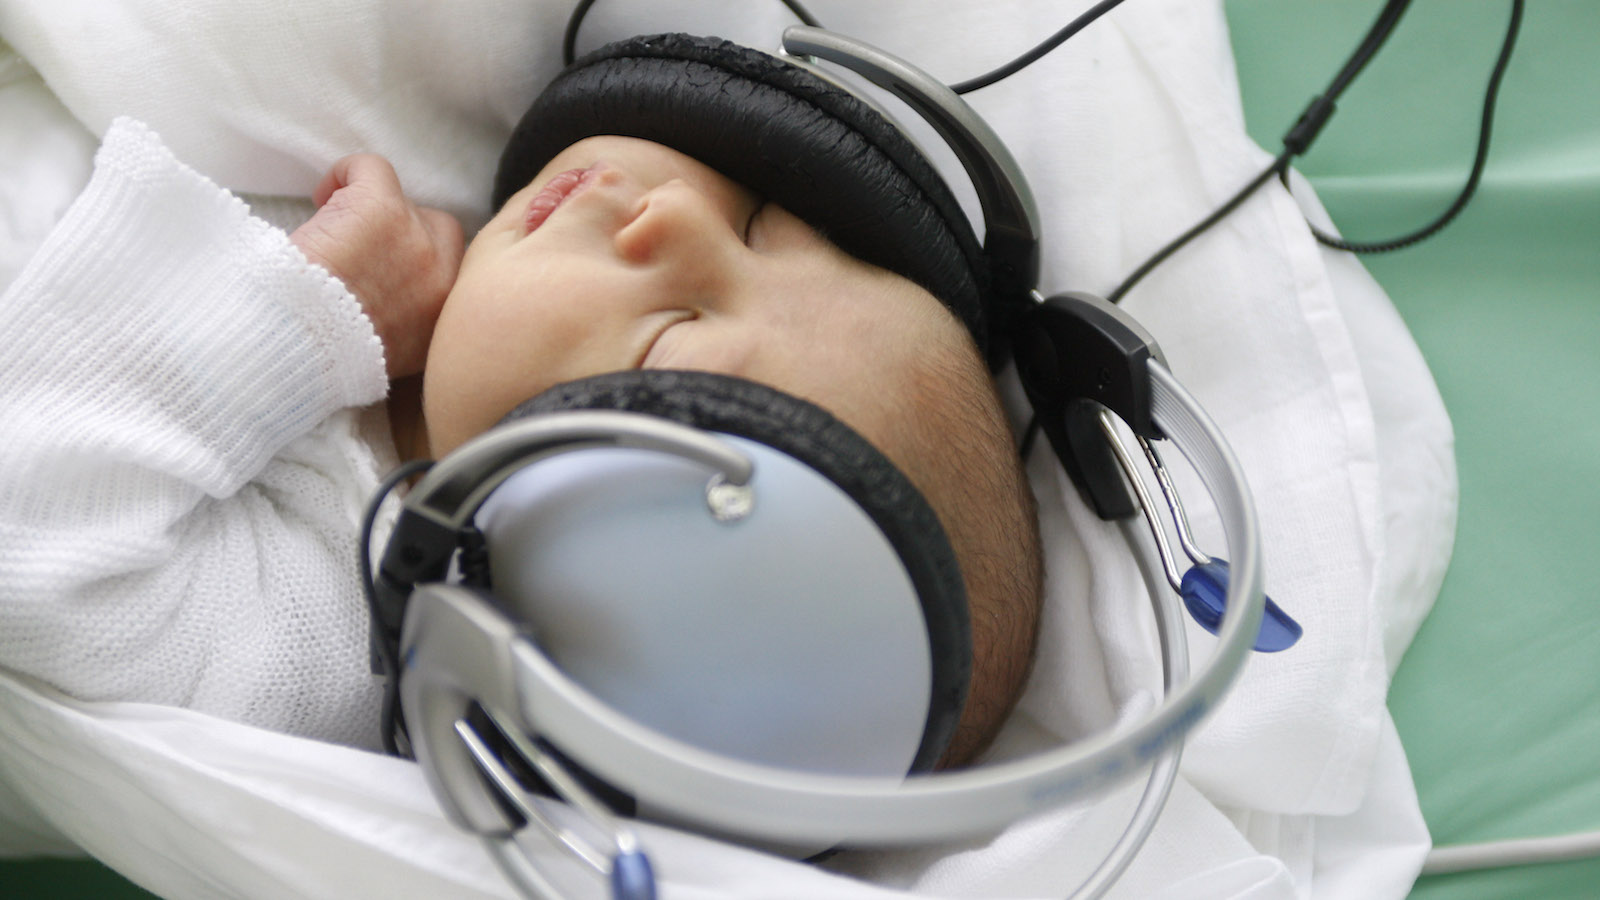 baby listening to music on headphones